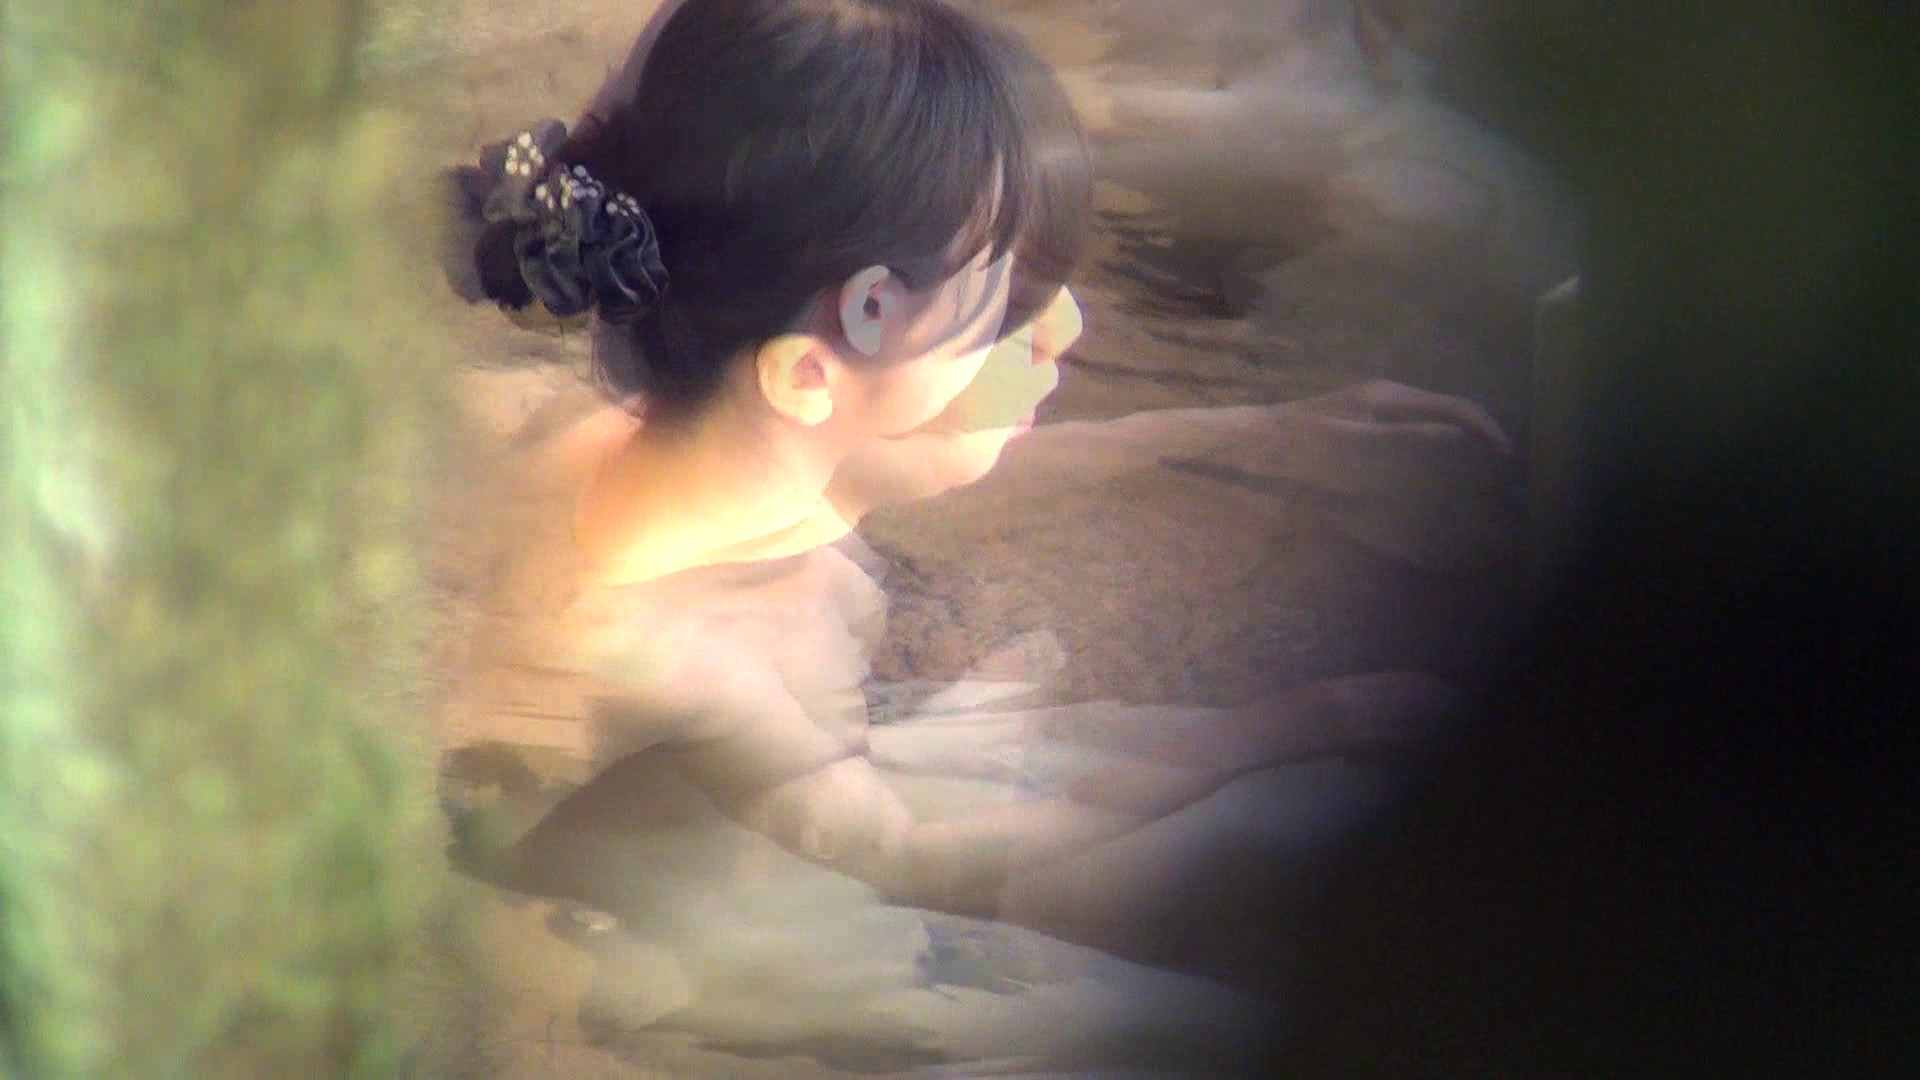 Aquaな露天風呂Vol.285 盗撮 おめこ無修正画像 24連発 5